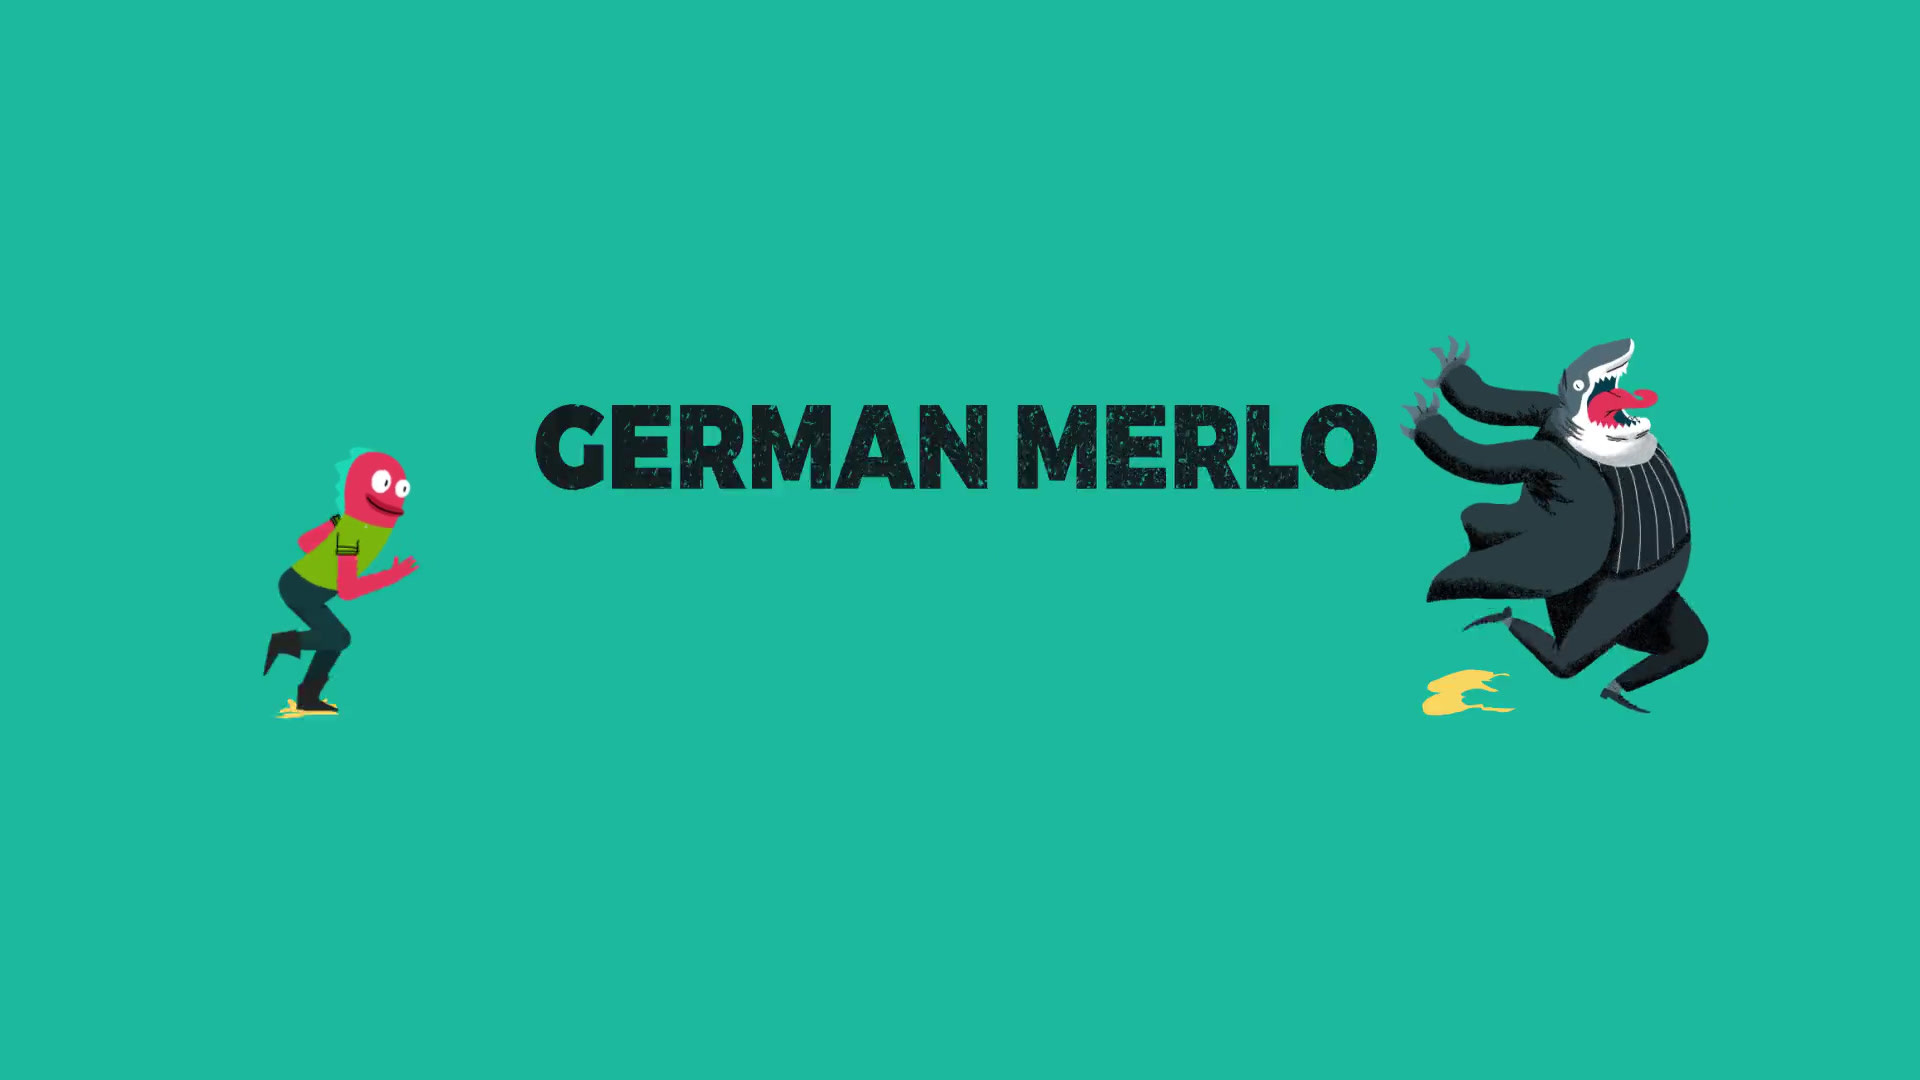 Animation persuit german merlo.mp4